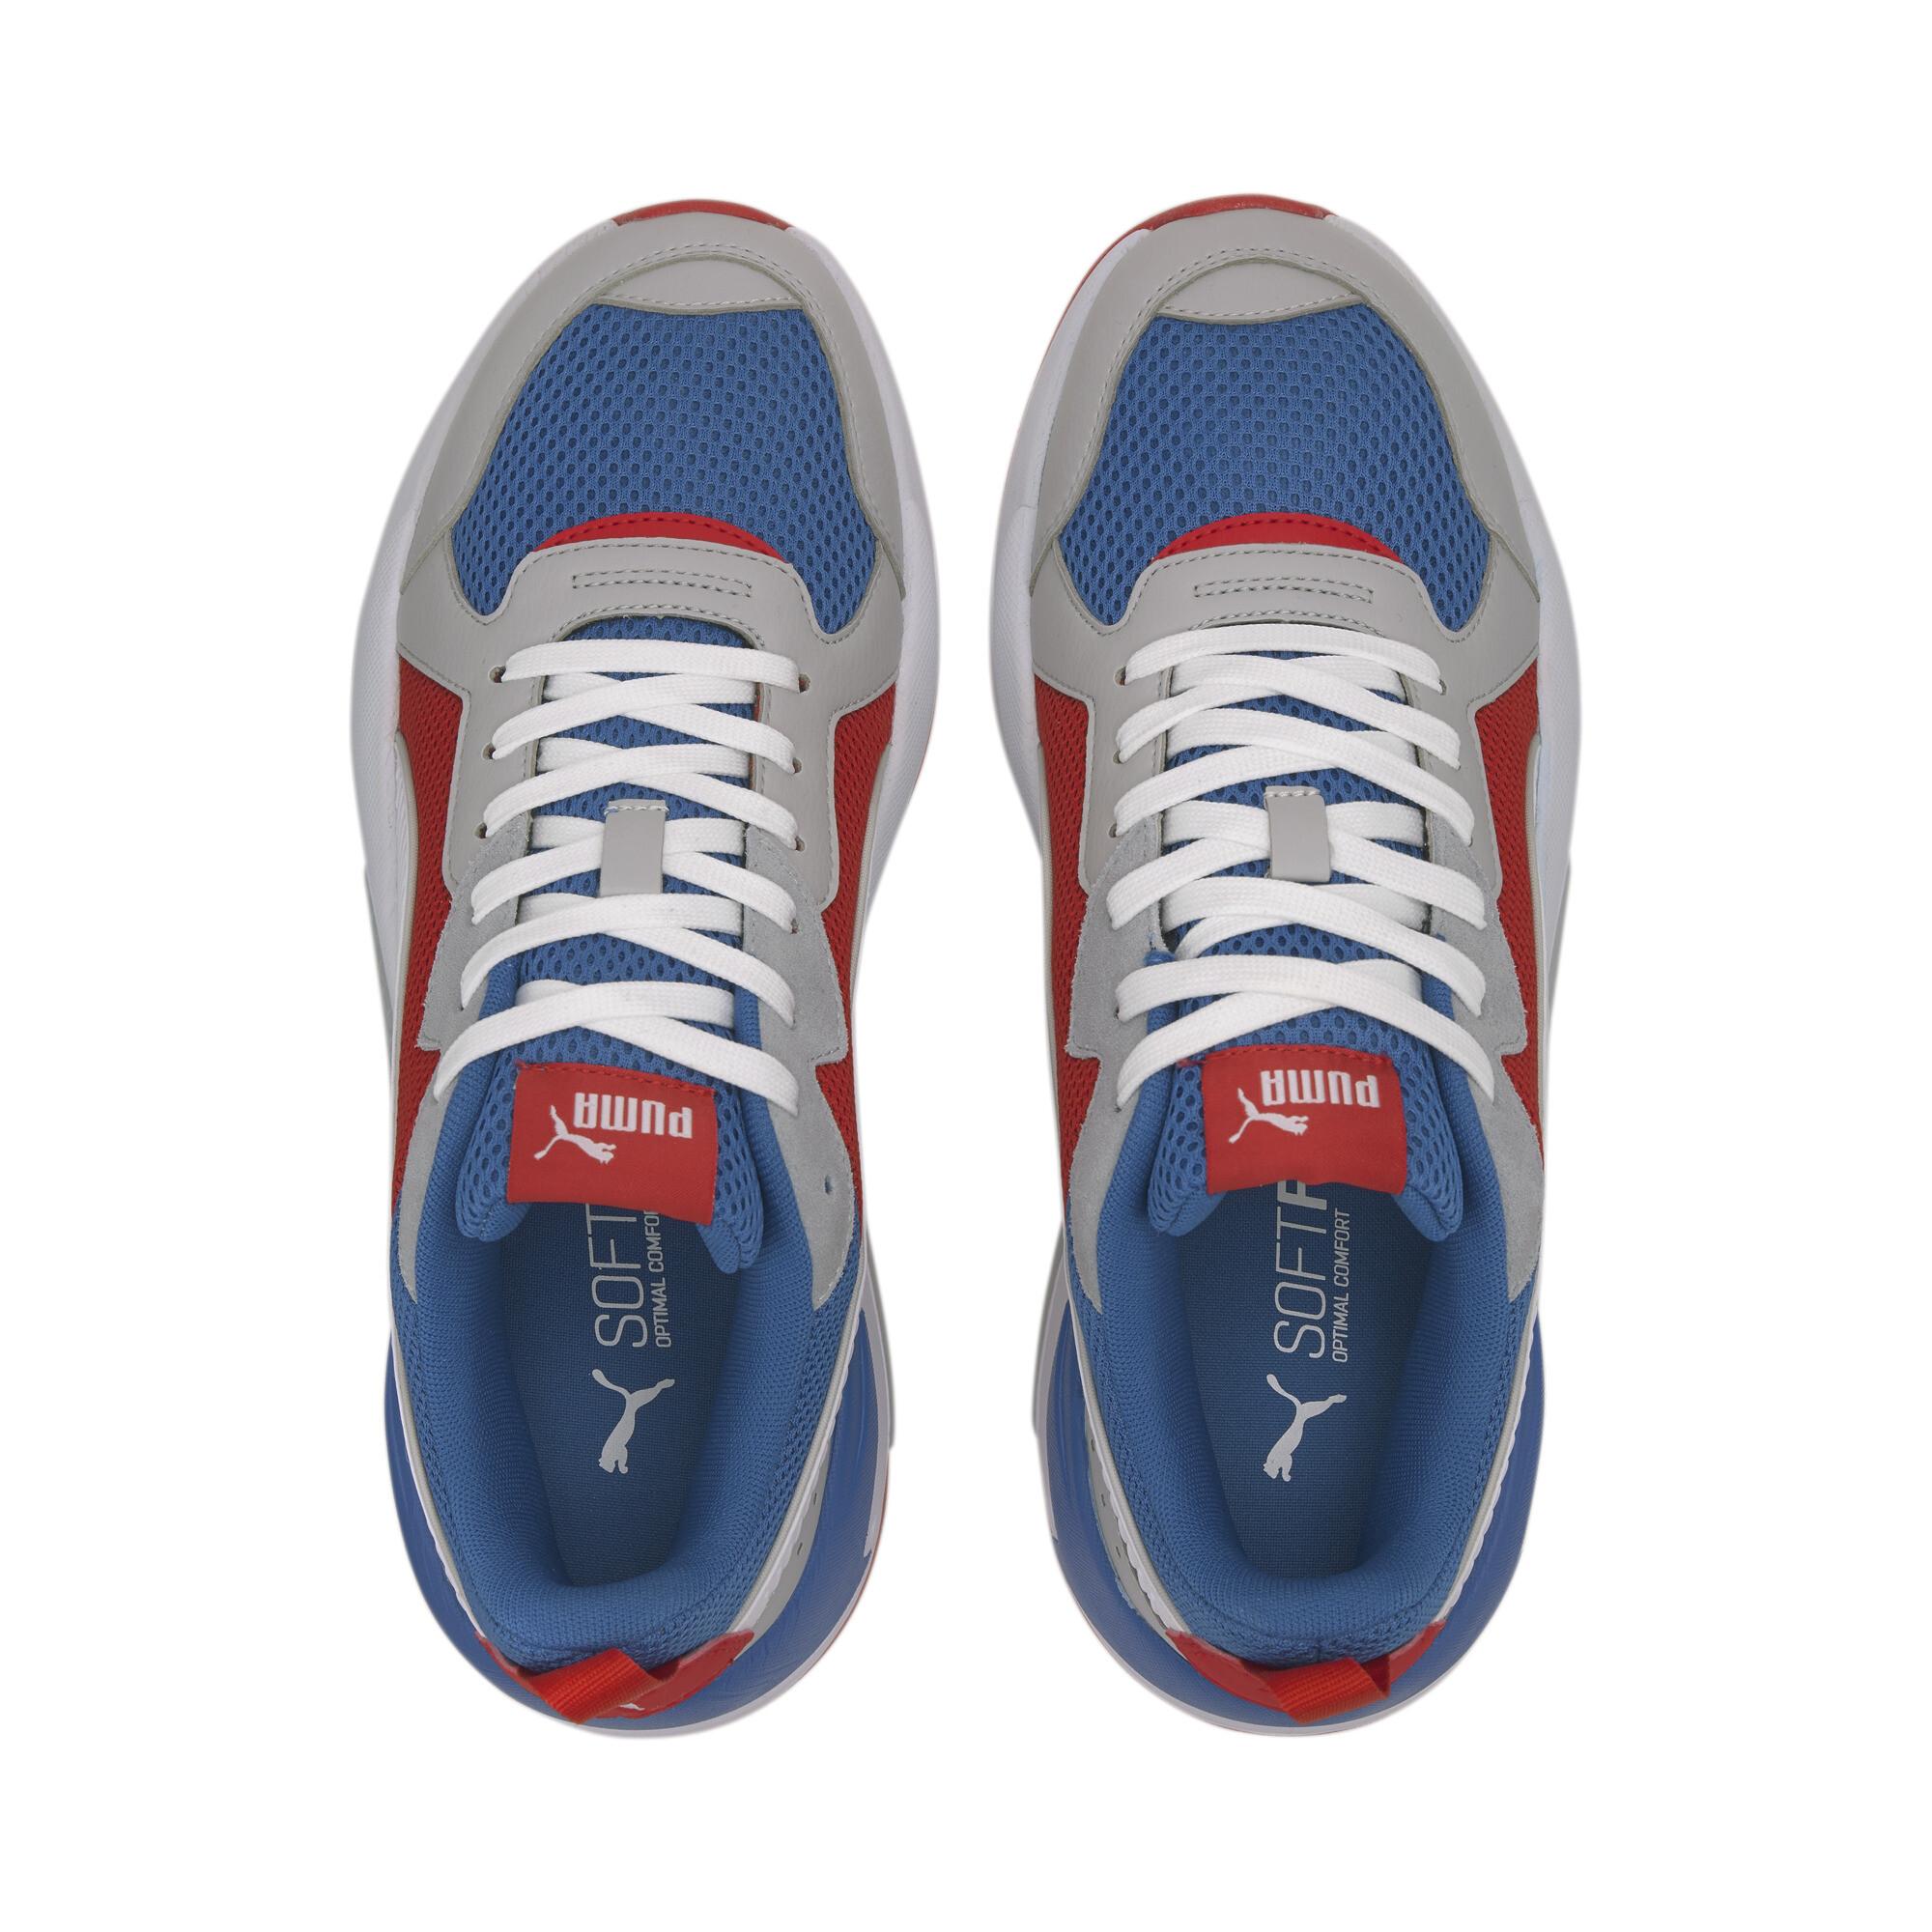 PUMA-Men-039-s-X-RAY-Sneakers thumbnail 15